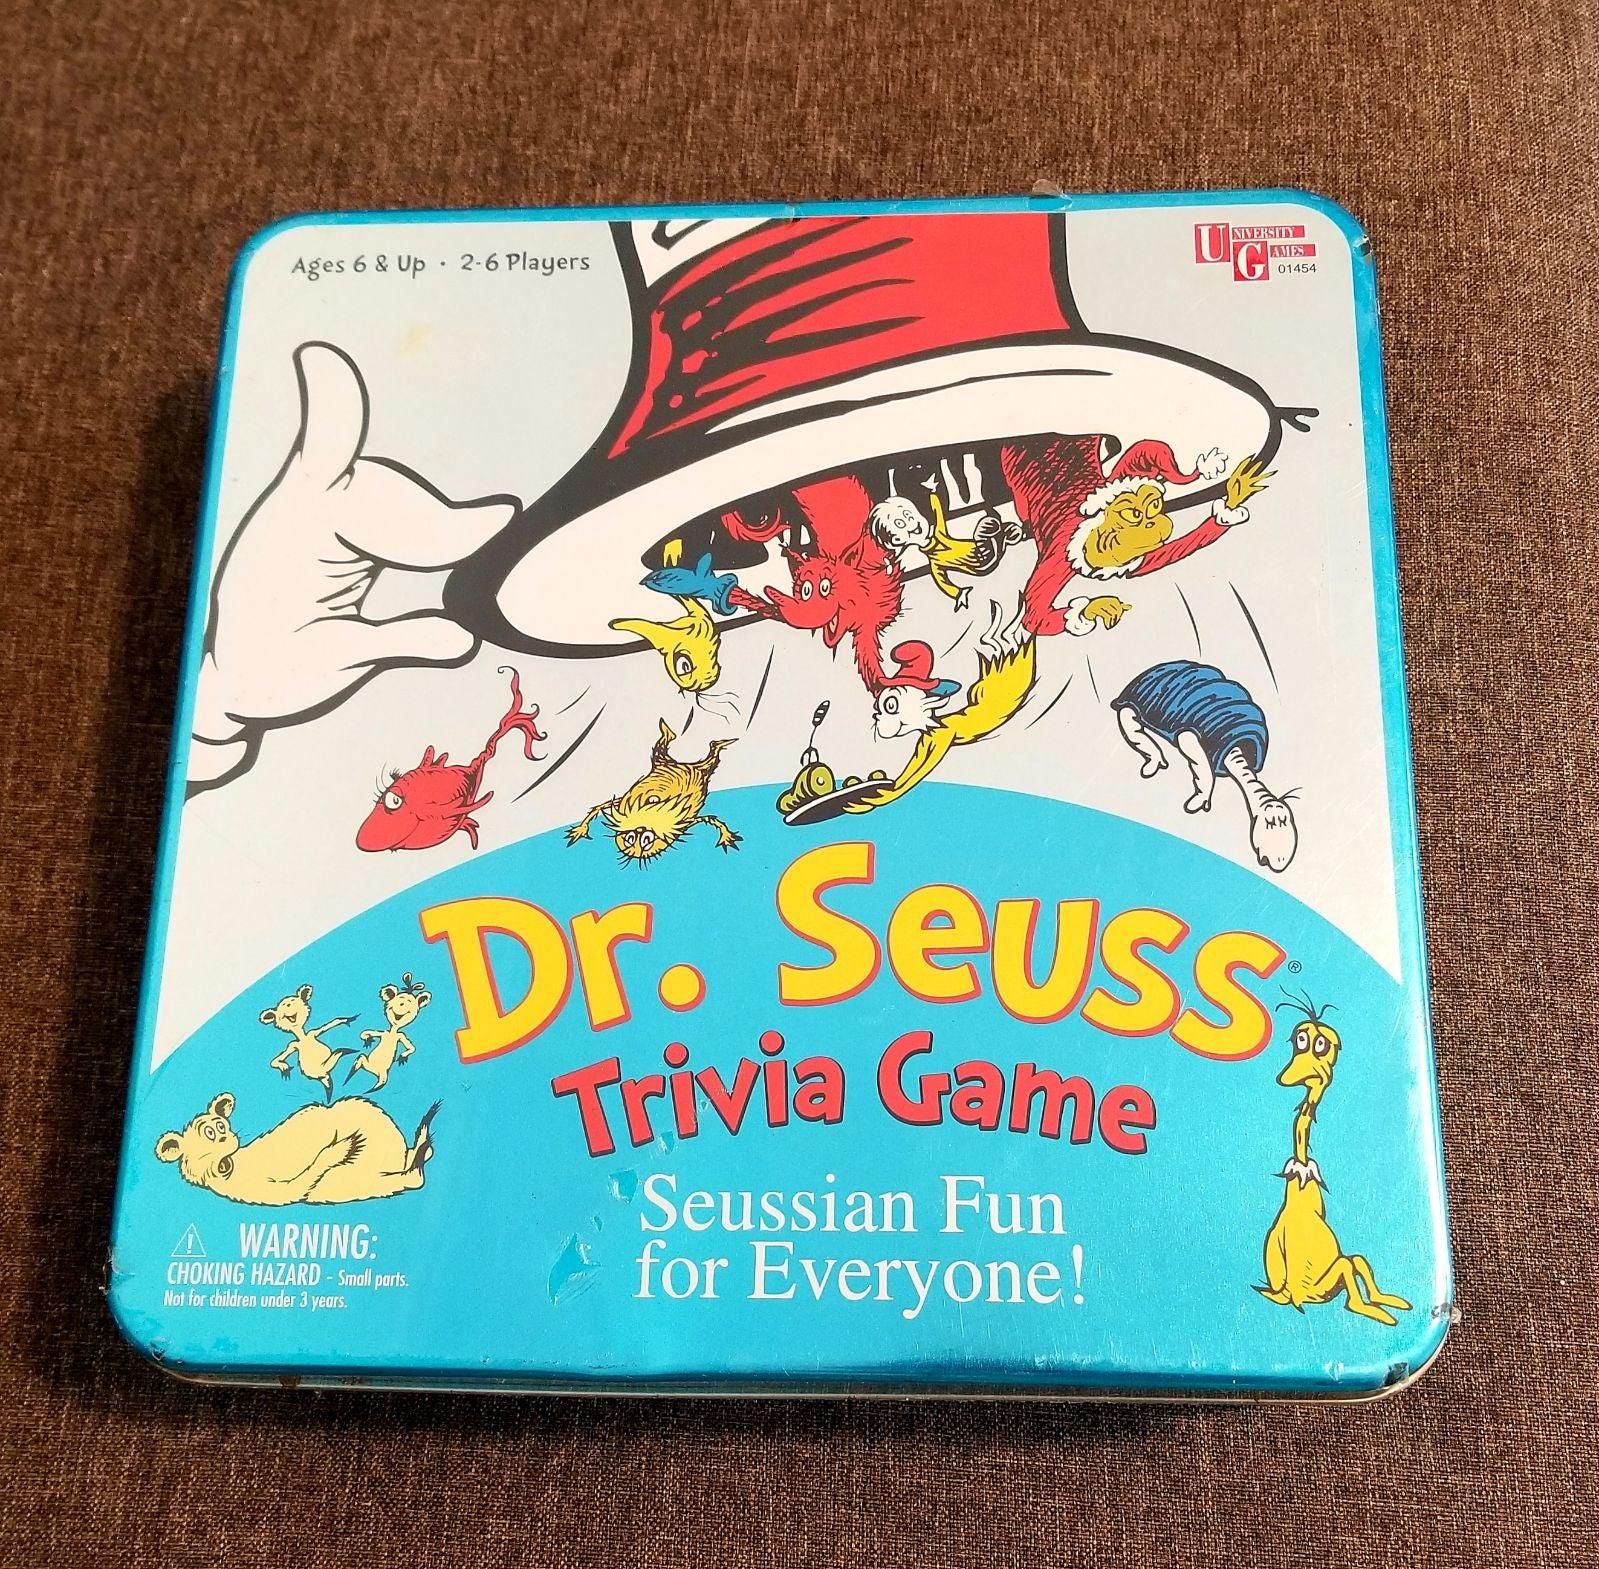 DR. SEUSS TRIVIA GAME